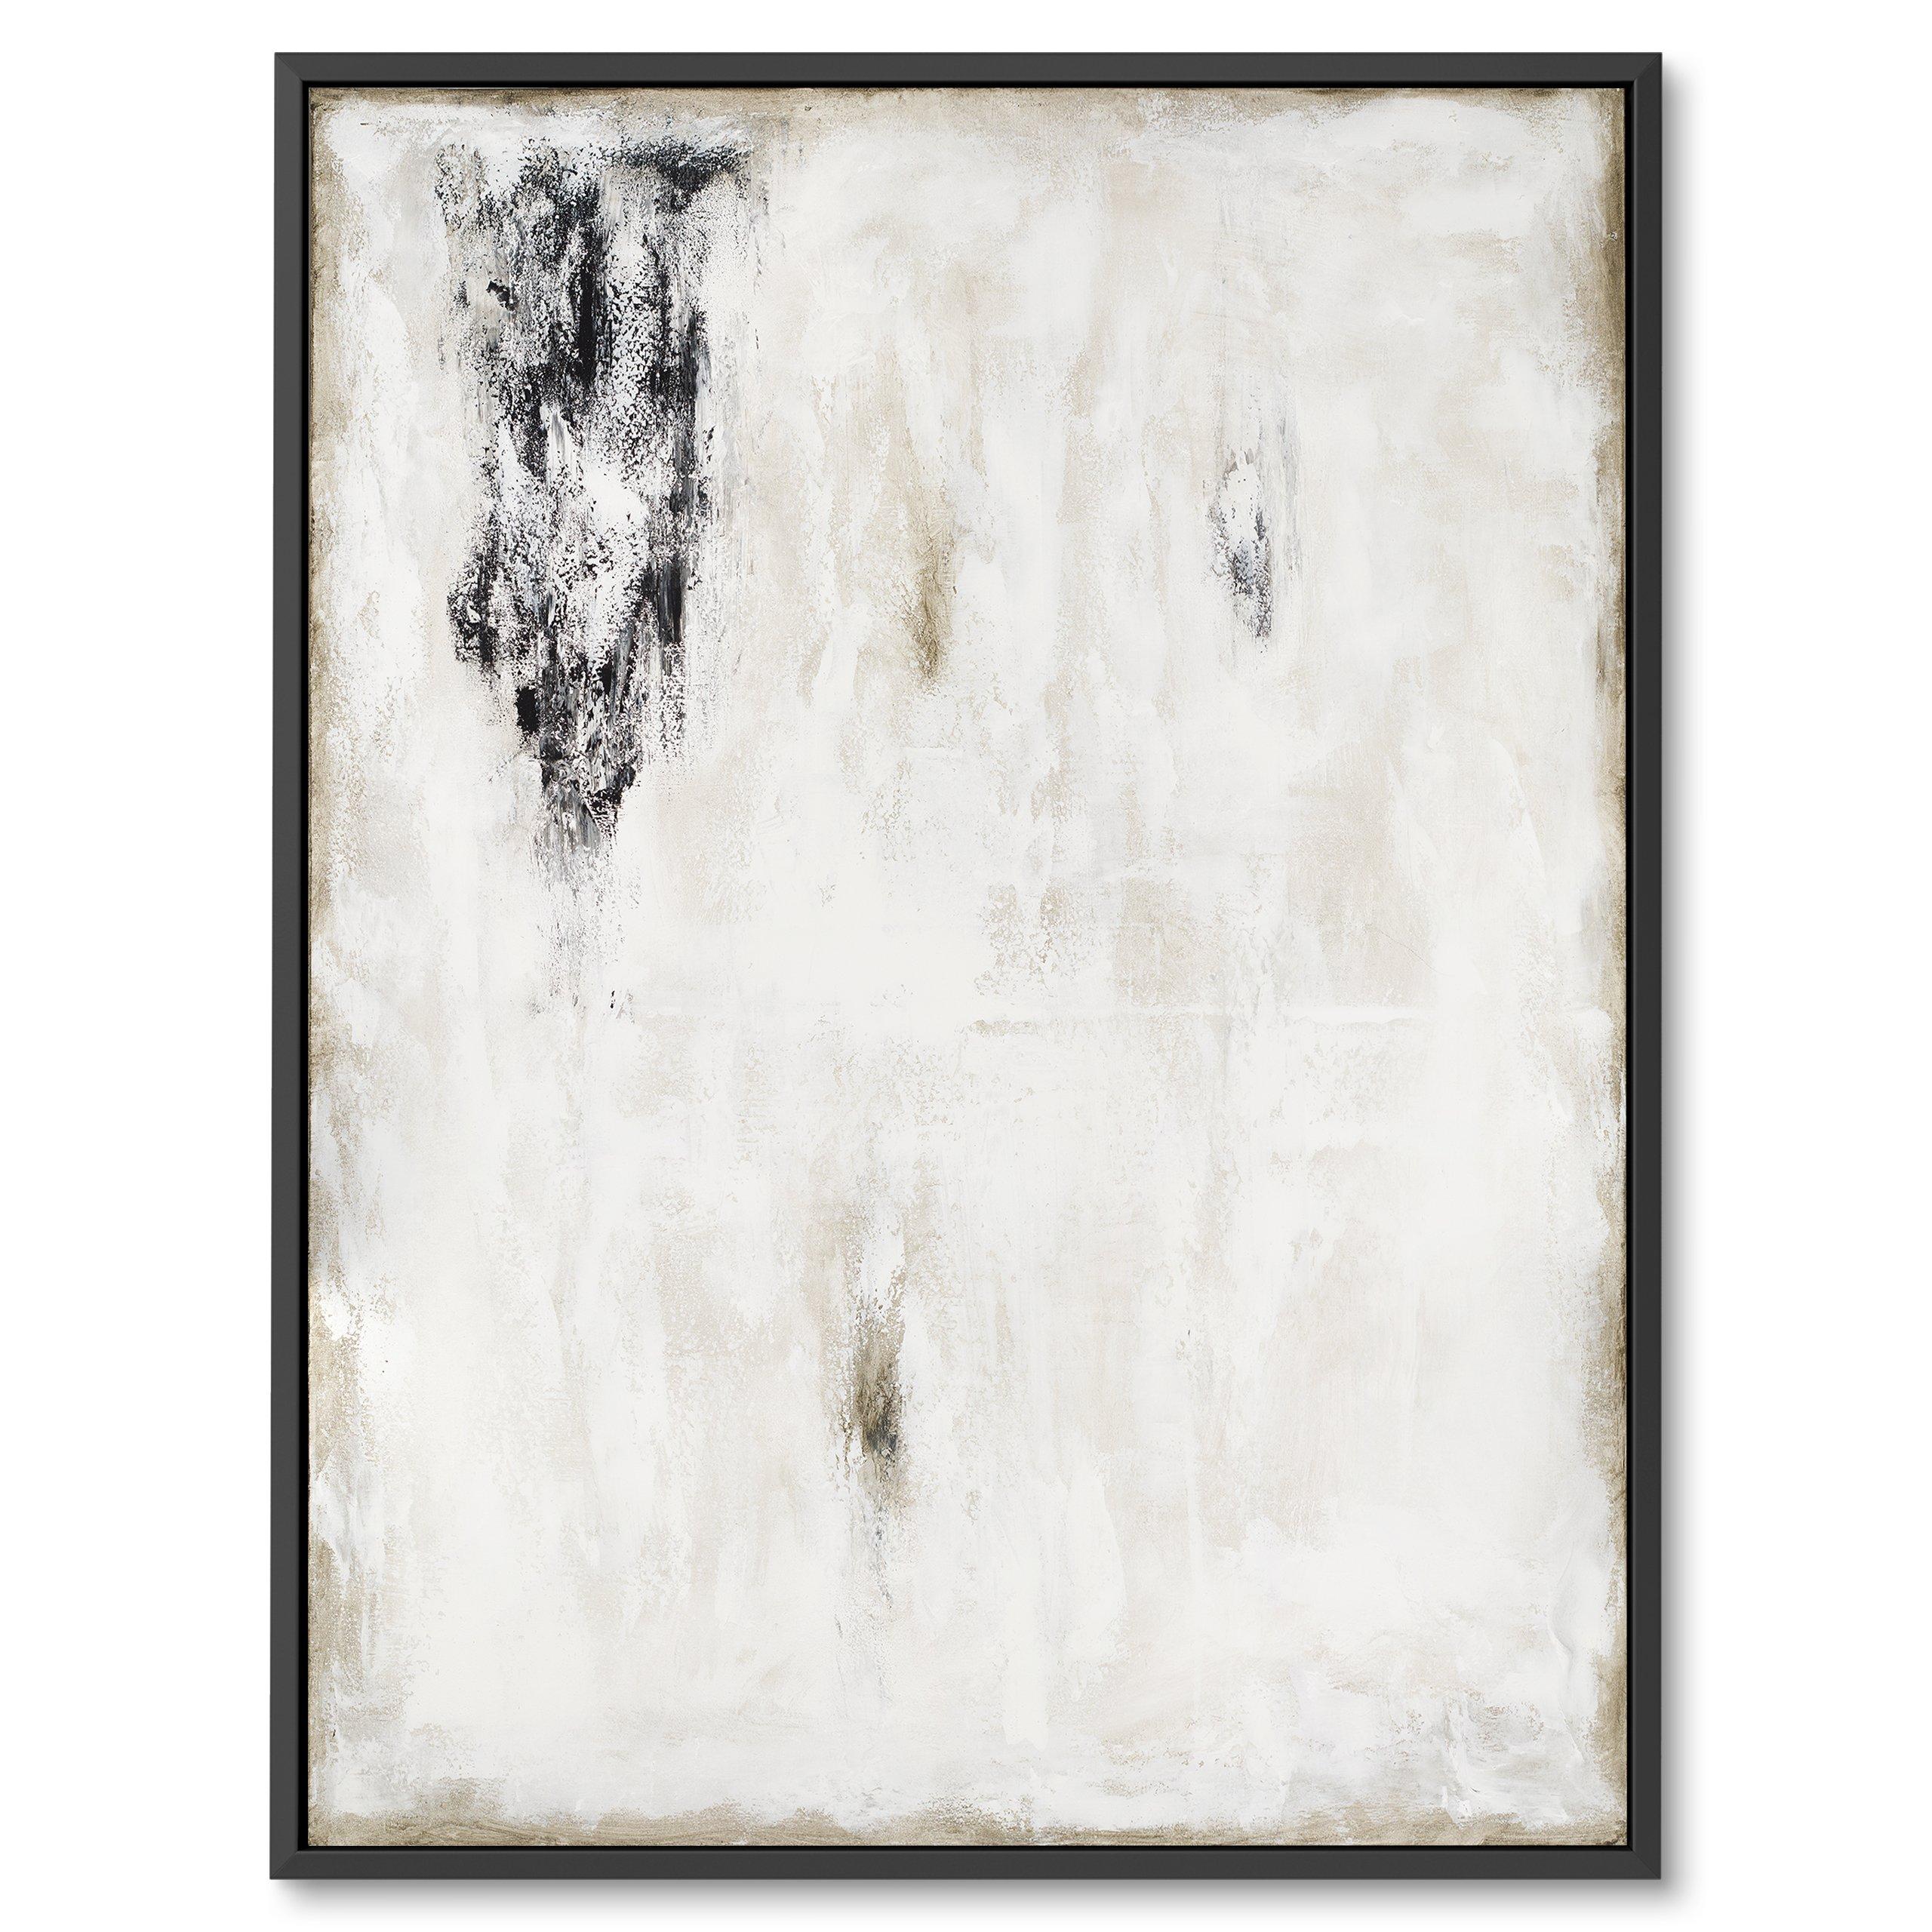 Black and white abstract art, Monochrome art, Duotone art, Grayscale art, Modern art, Home decor